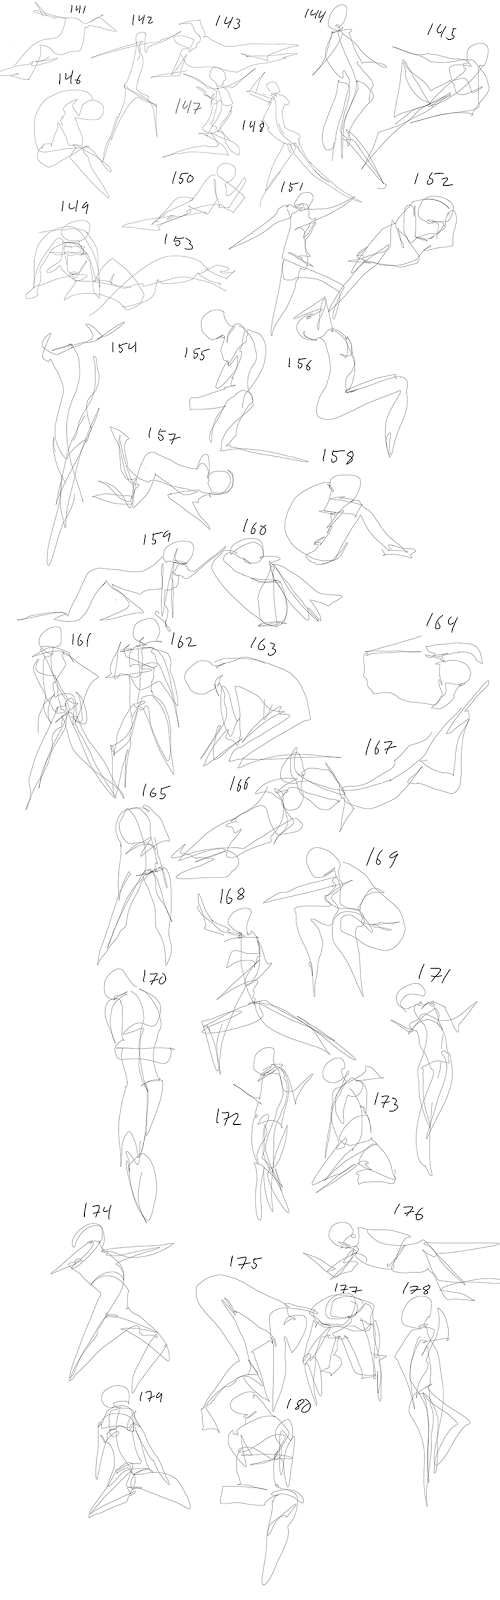 [Image: Gestures_06.png]